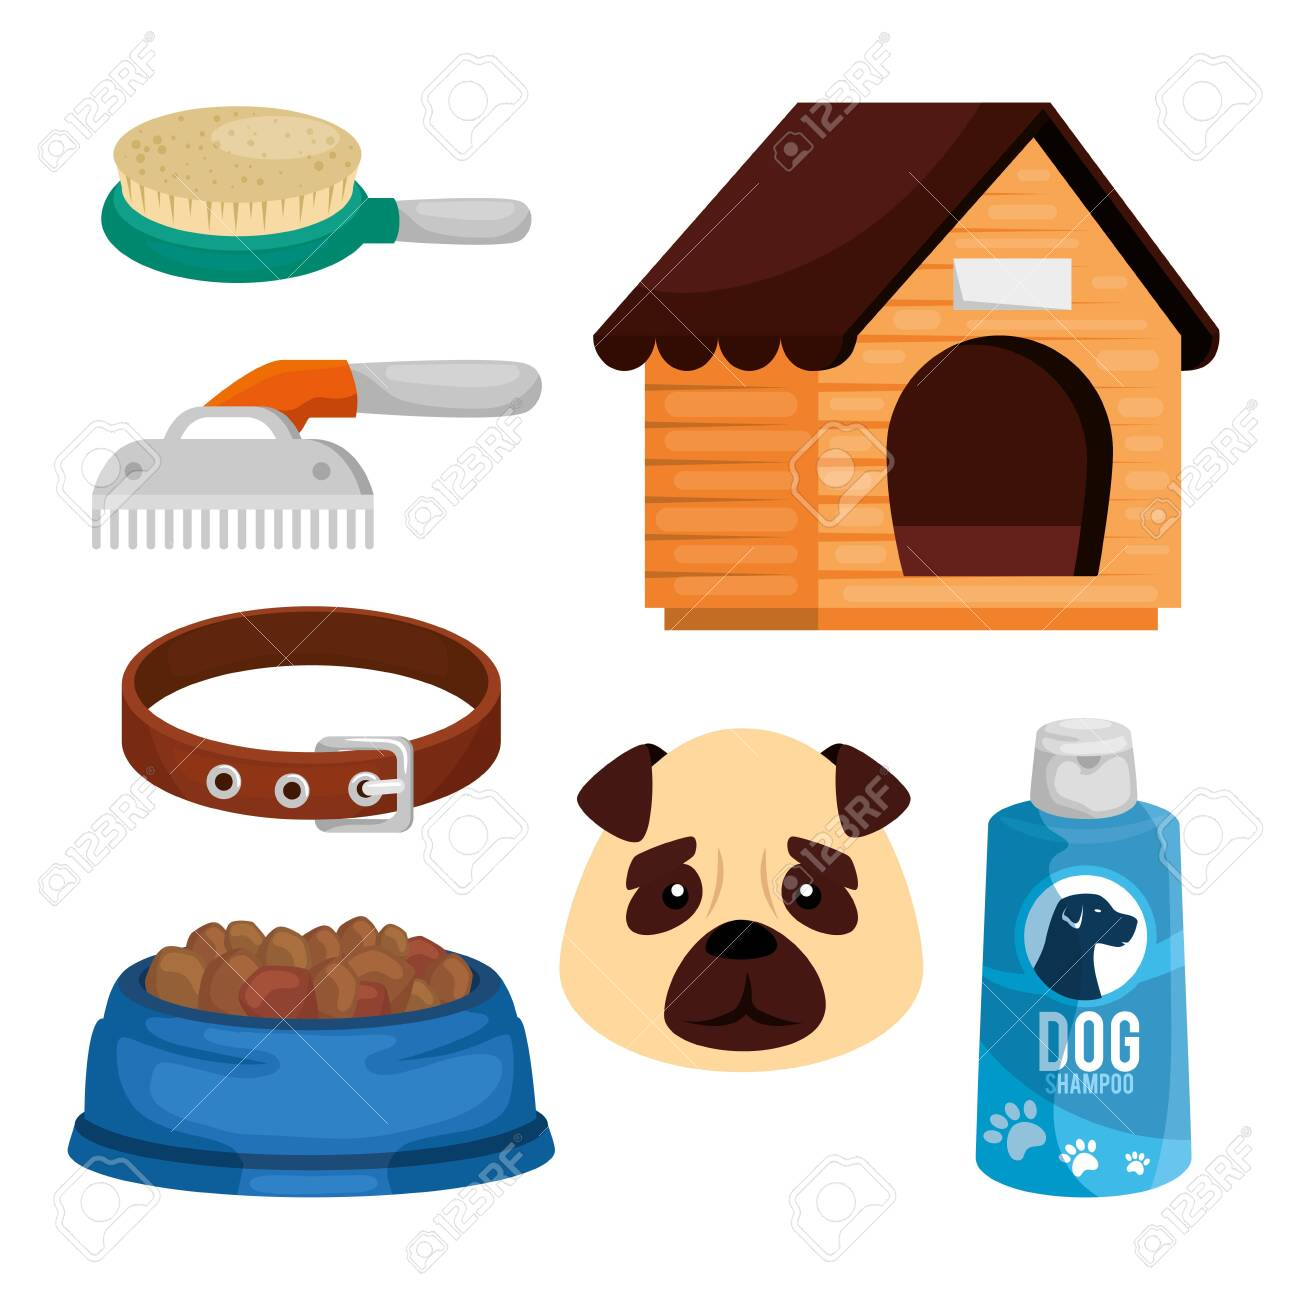 set items pet shop icons vector illustration design - 140587494